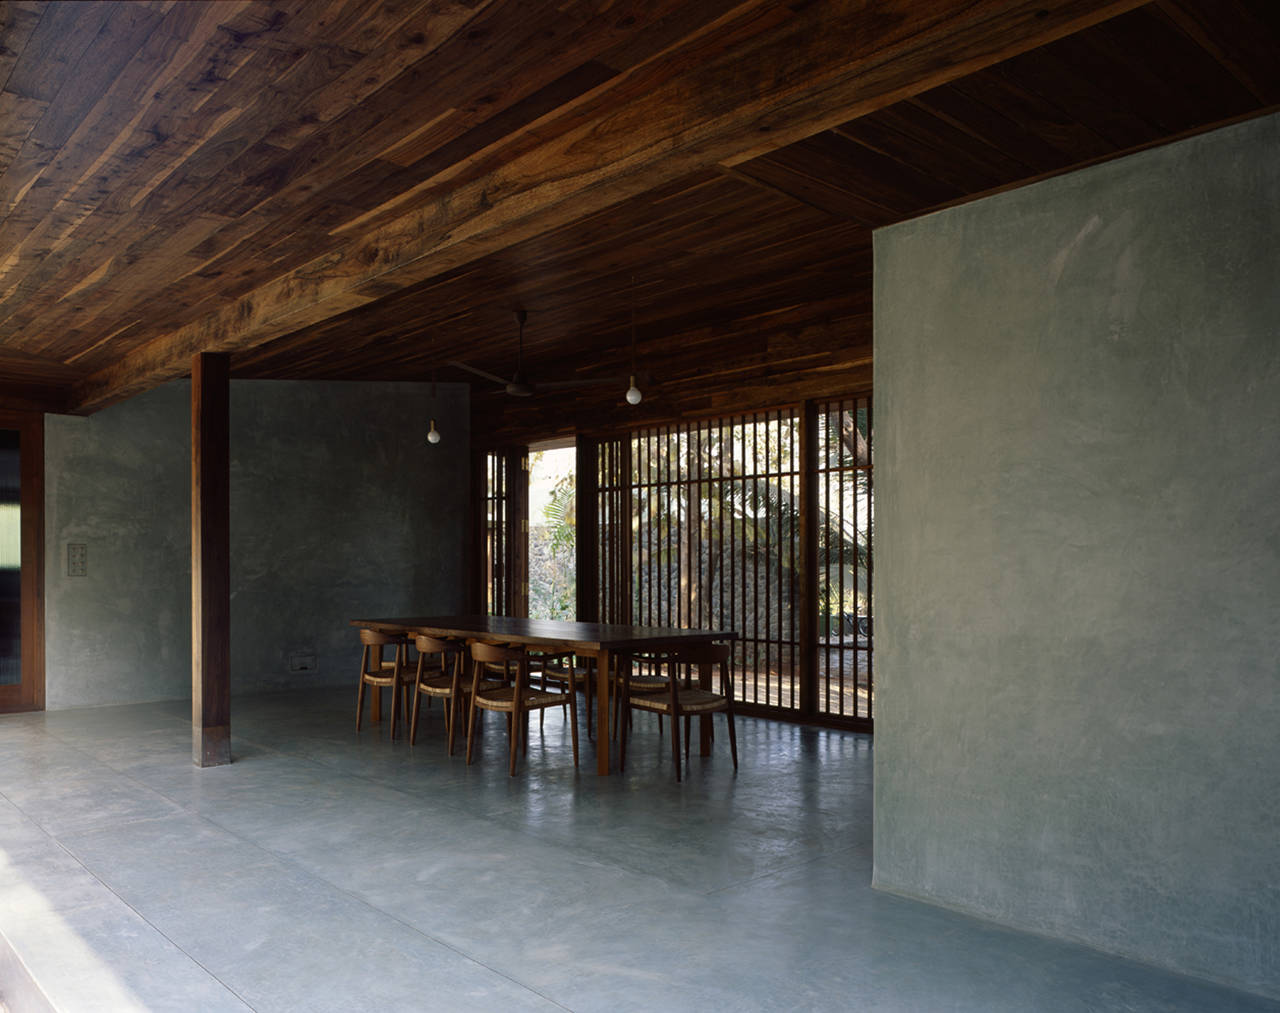 Fall Garden Wallpaper Studio Mumbai Architects Copper House Anyonegirl